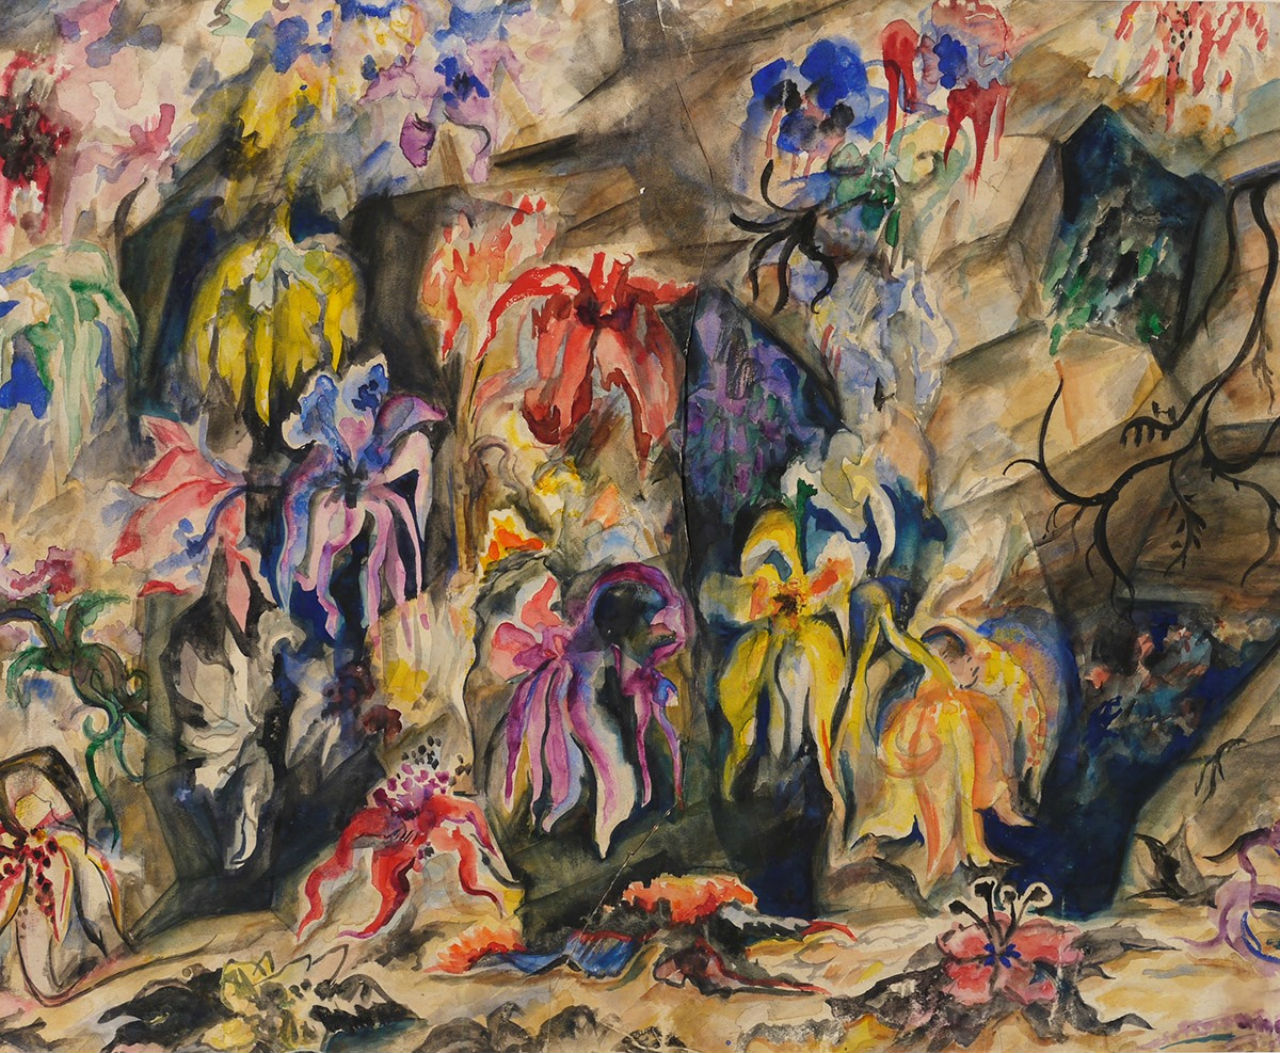 44-Наталья Гончарова - Эскиз декорации к балету - 1948.jpg